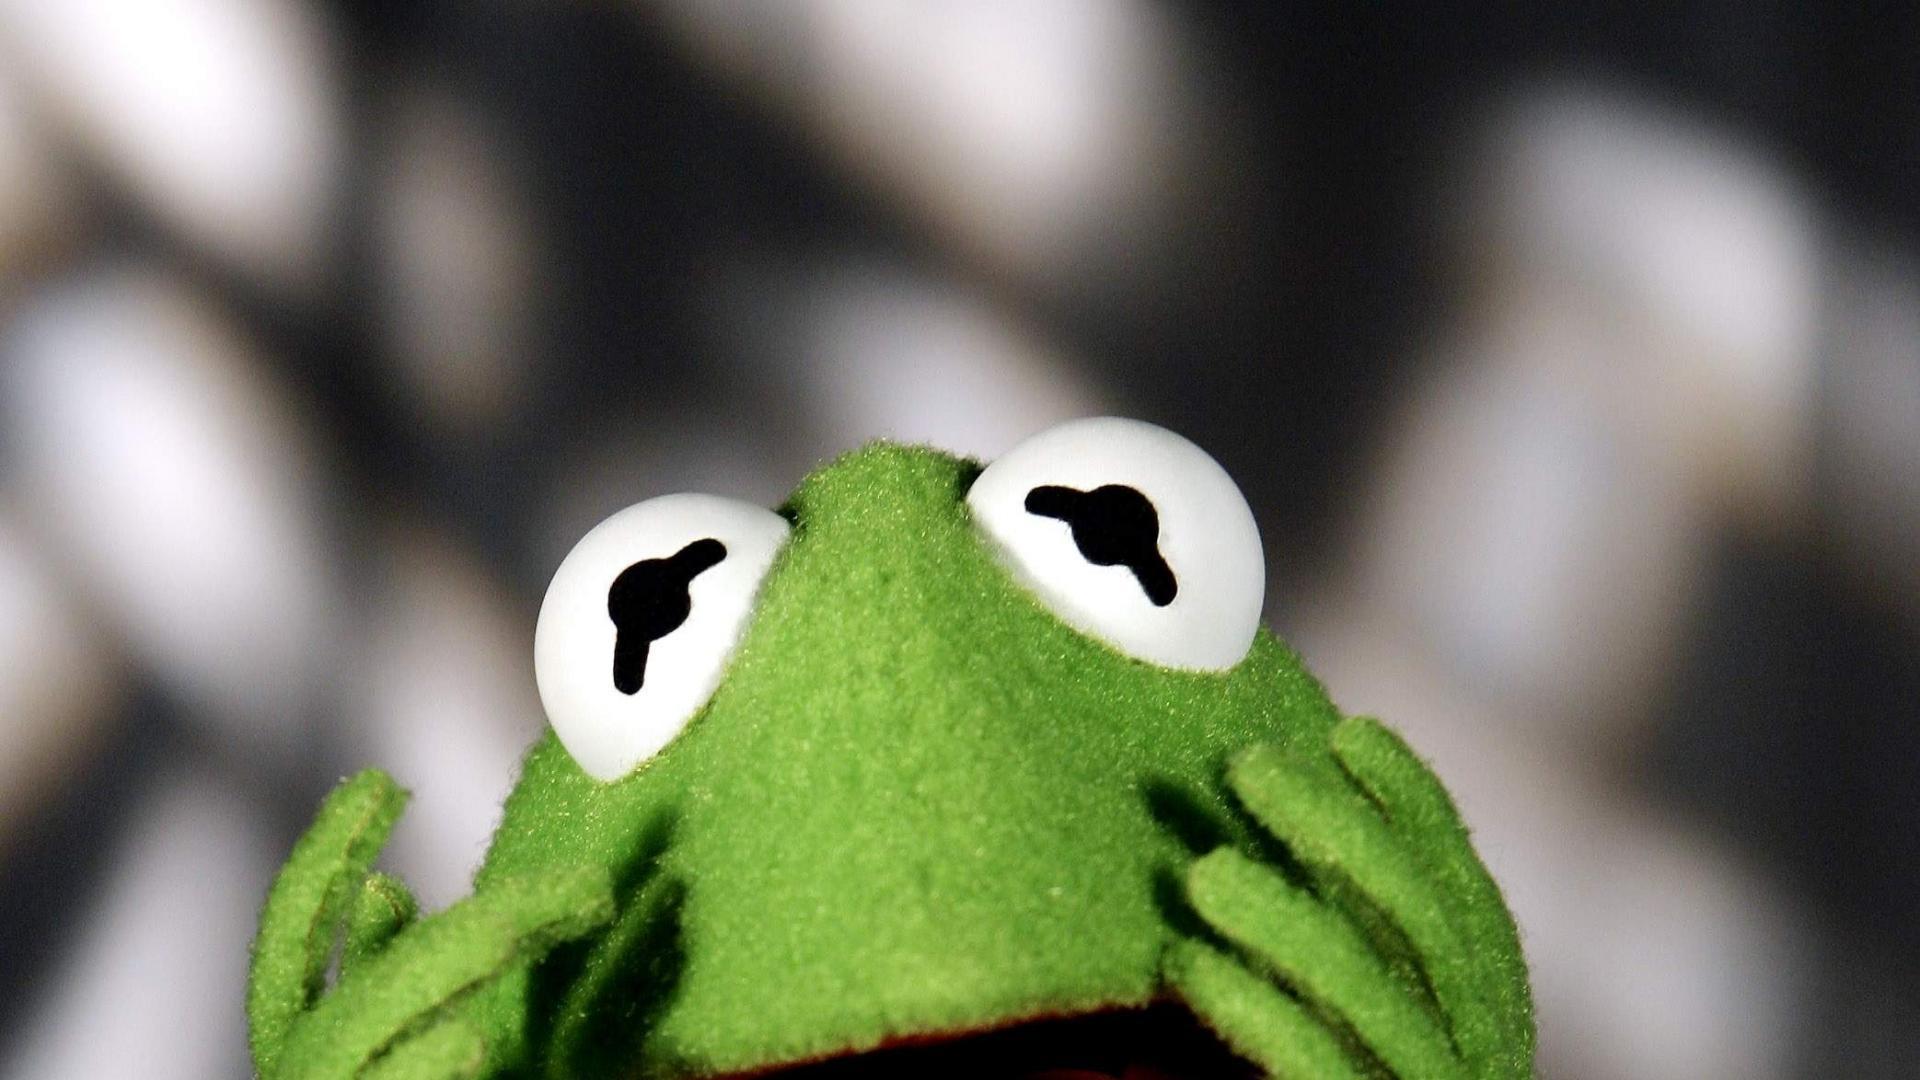 41 Kermit The Frog Wallpaper On Wallpapersafari